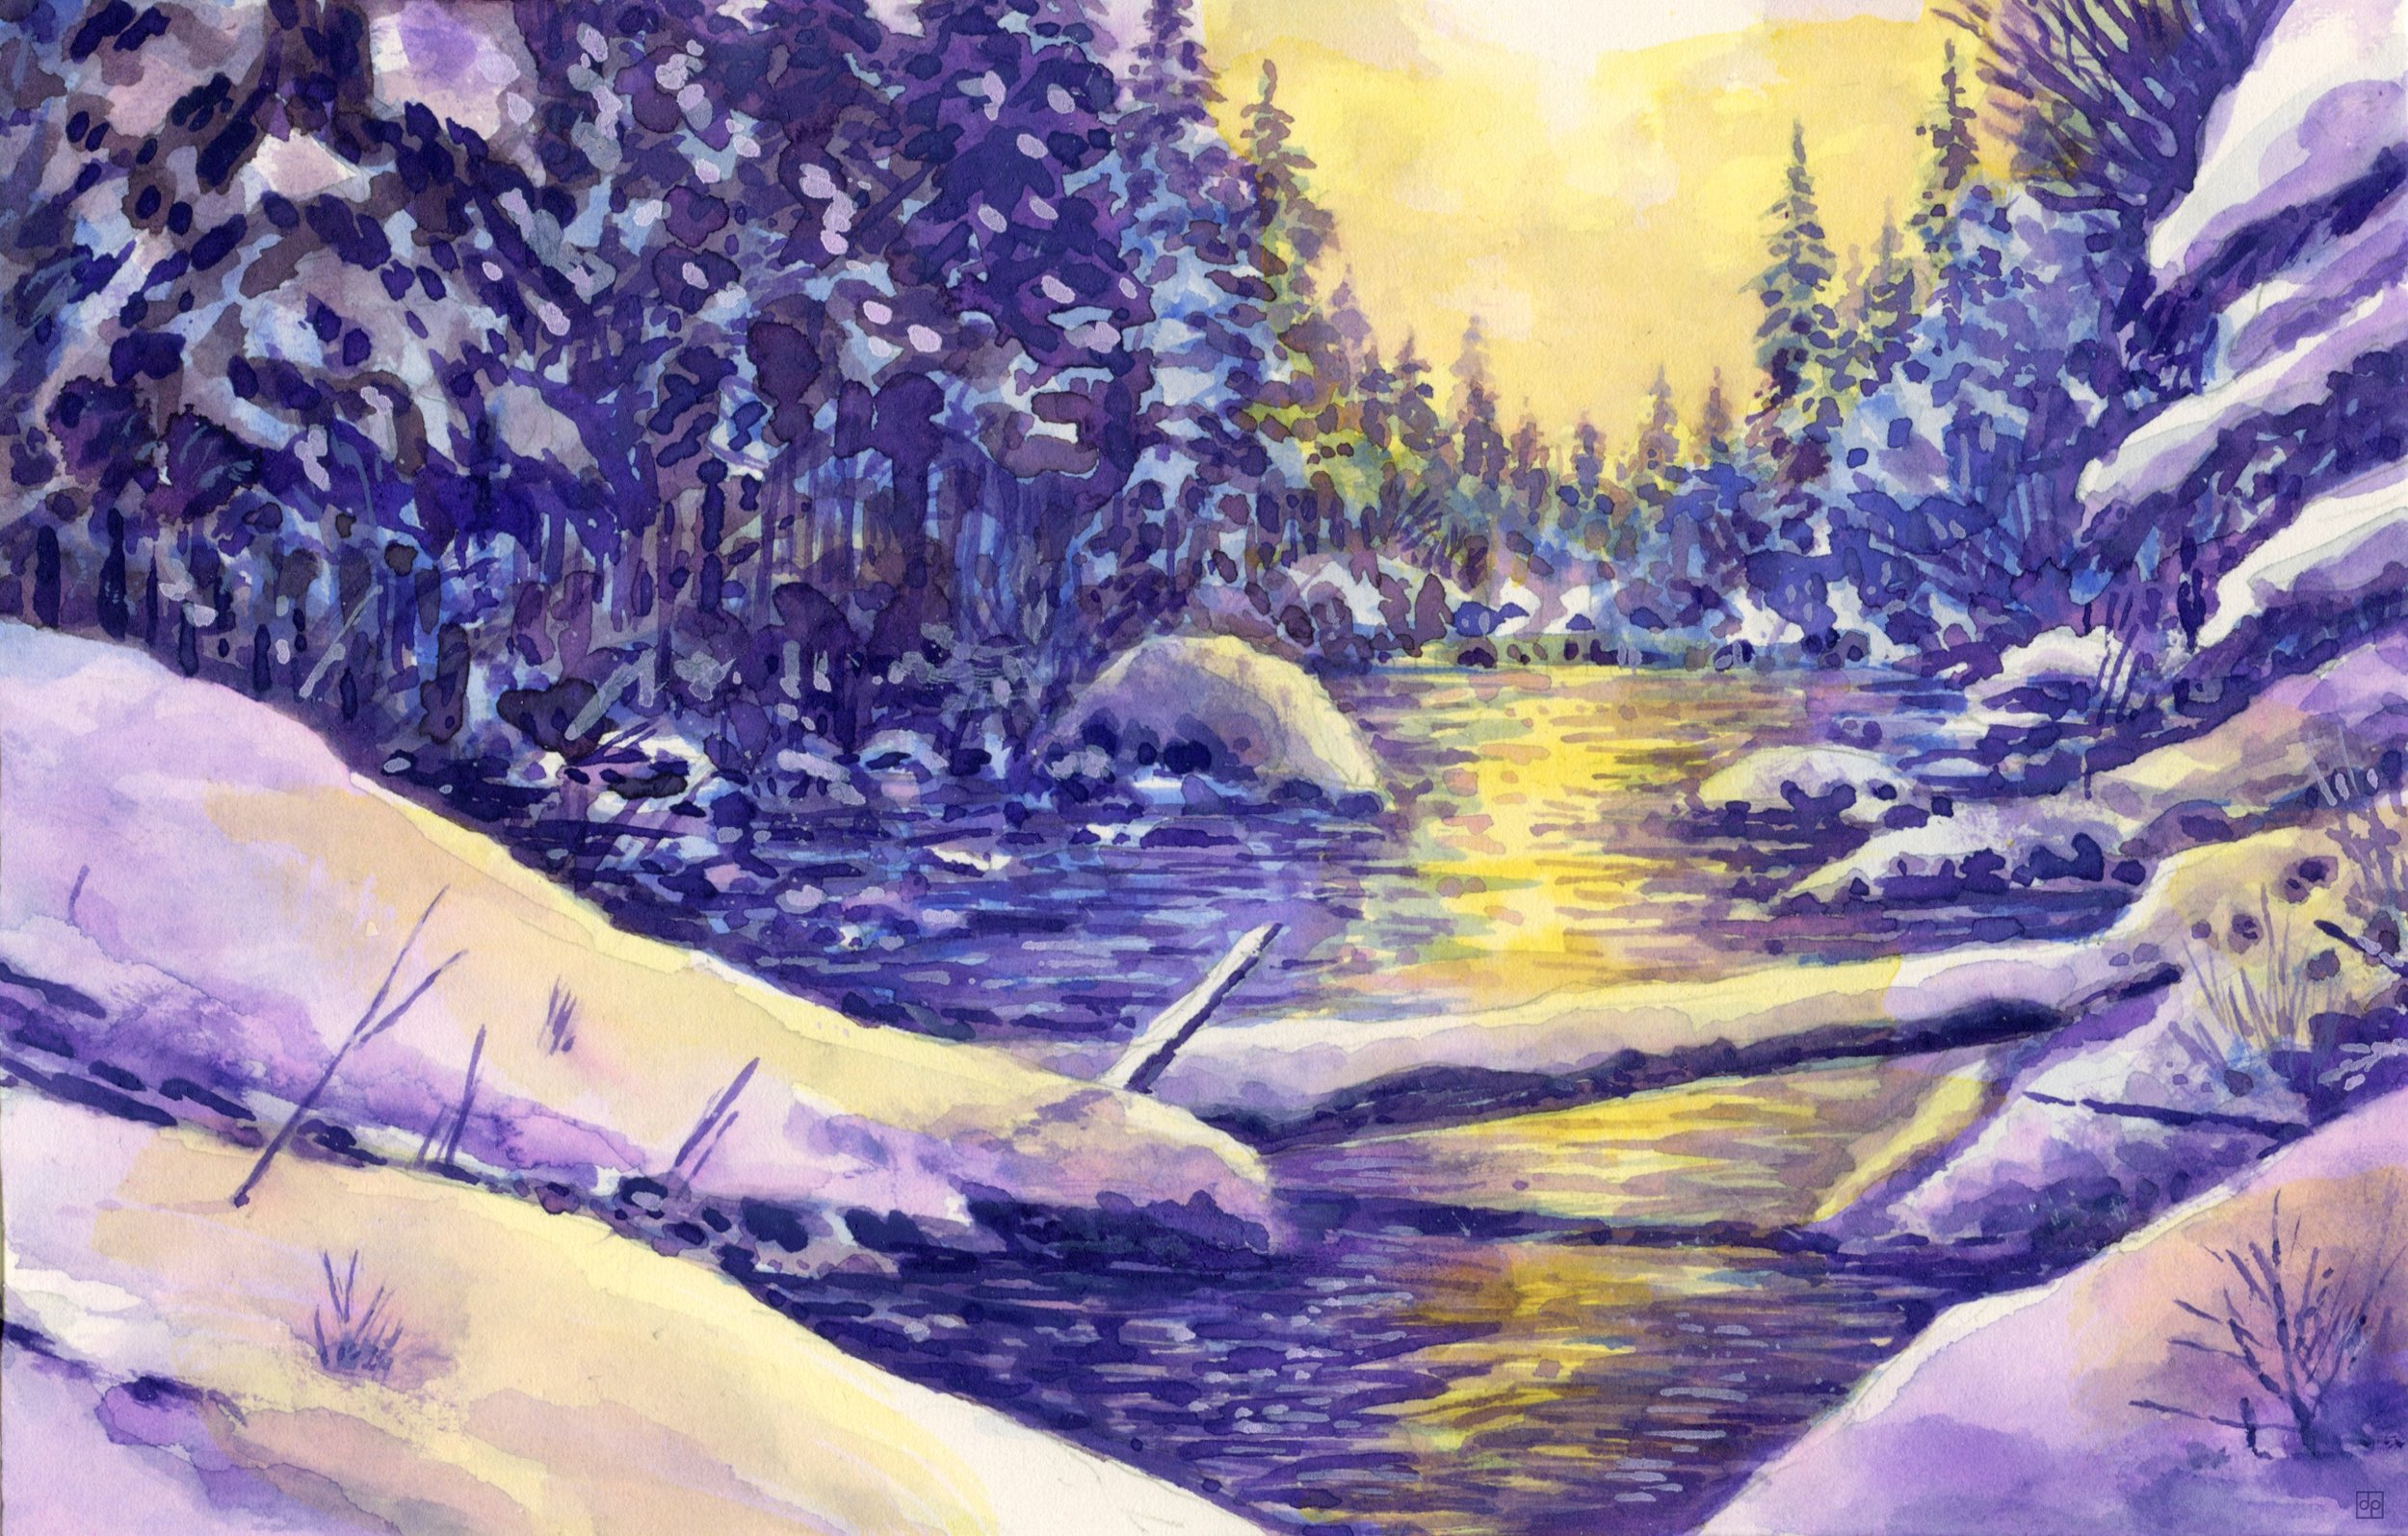 Rivière enneigée.jpg